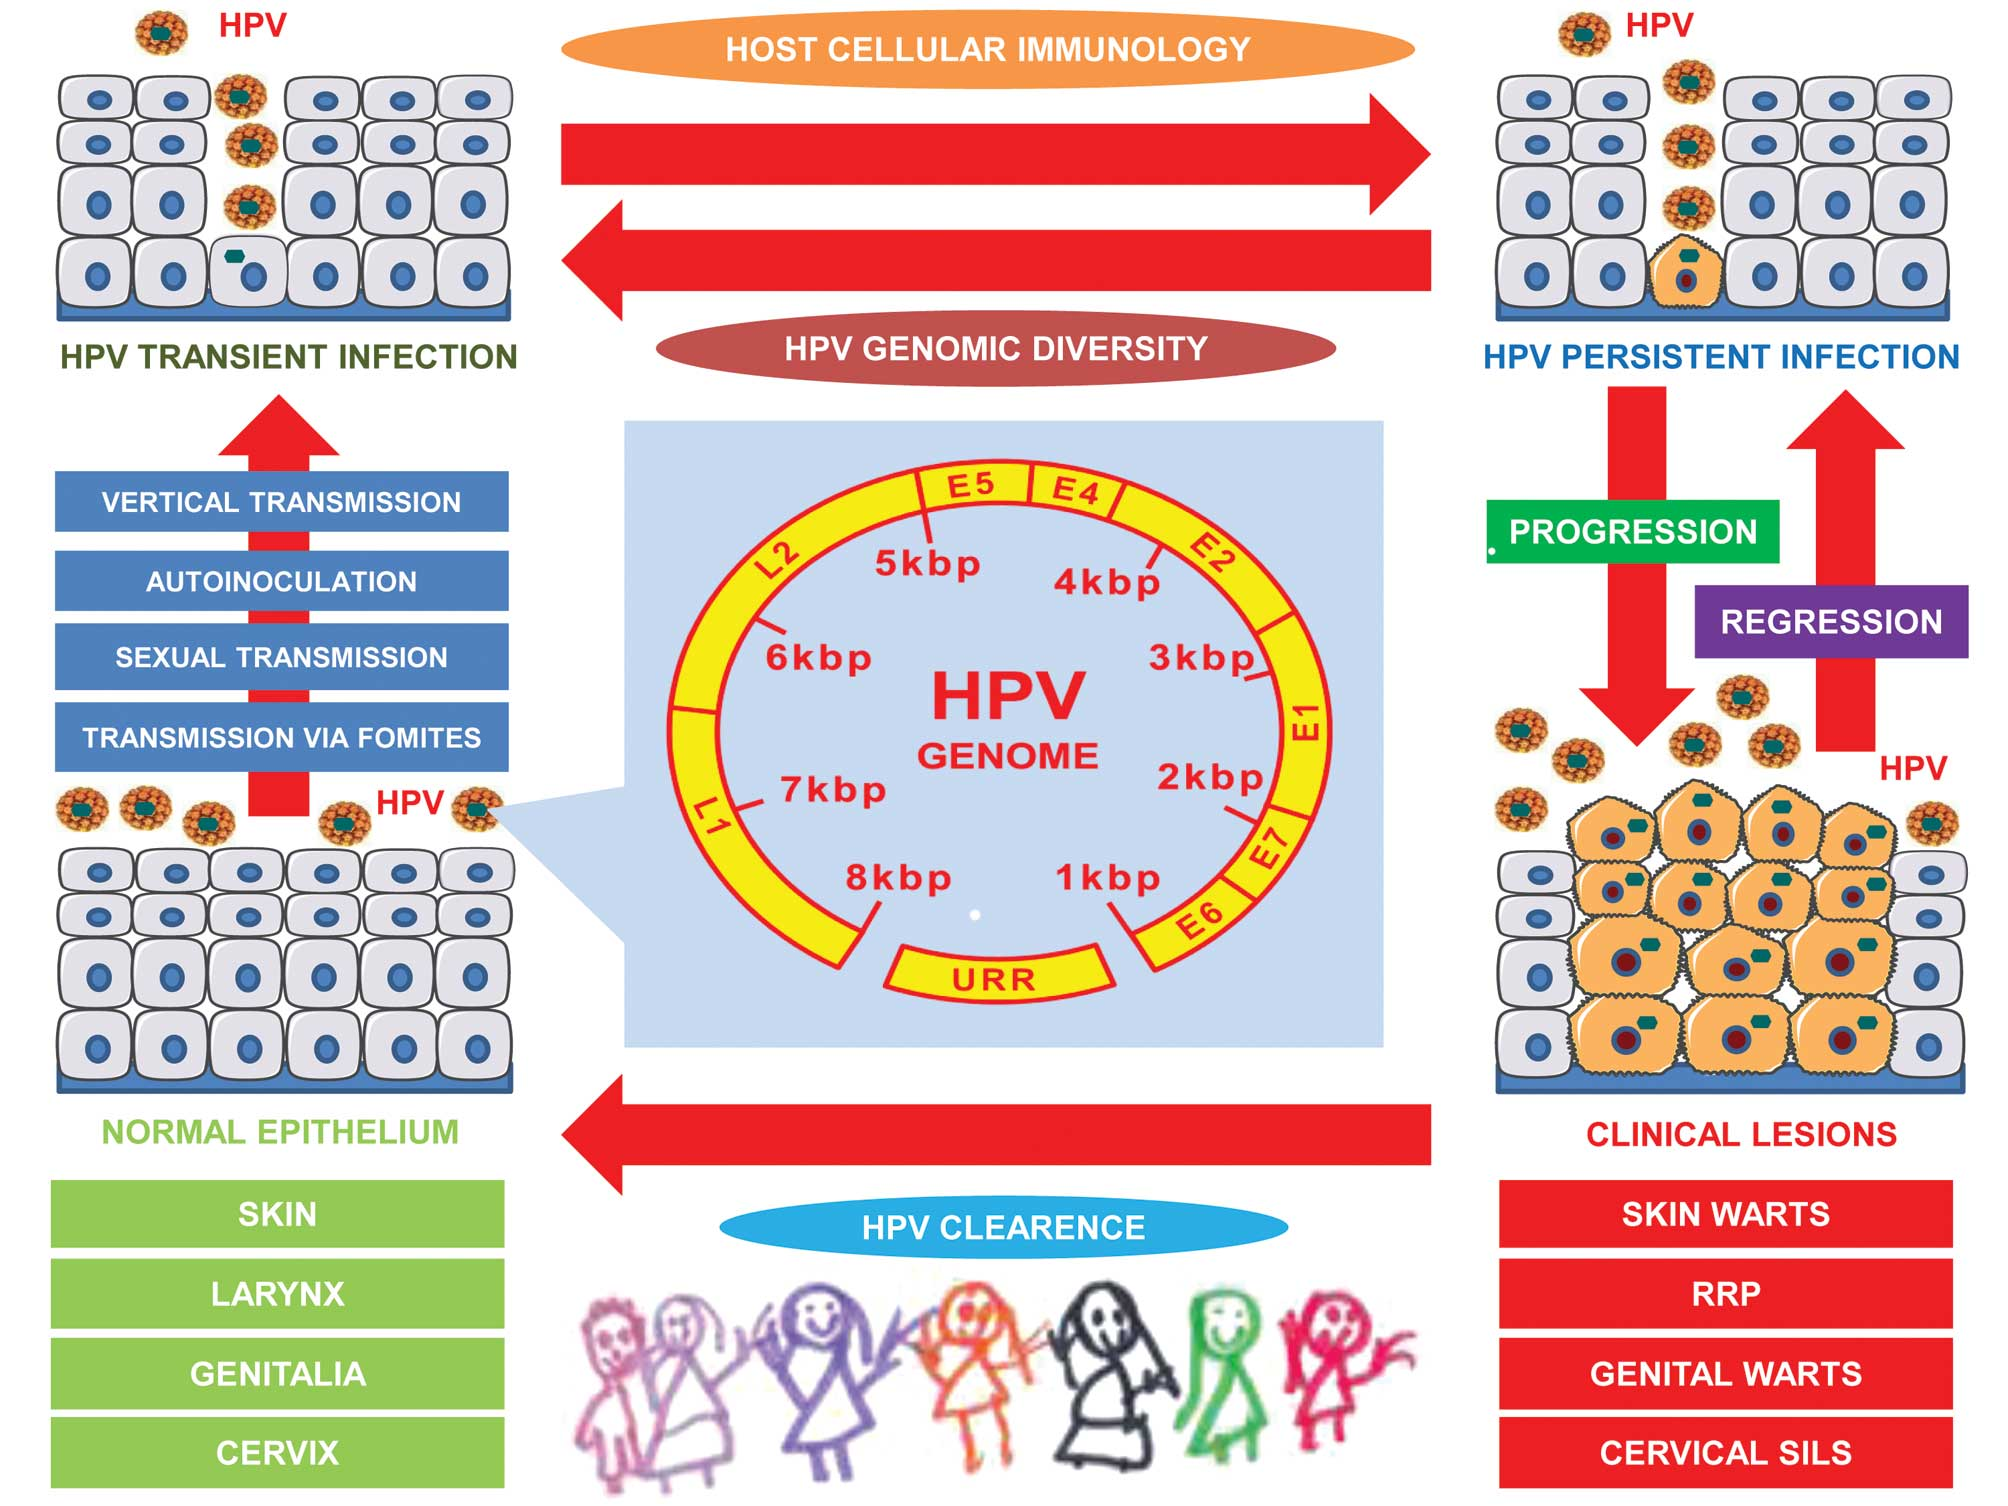 Noi tratamente sistemice în infecţia cu HPV